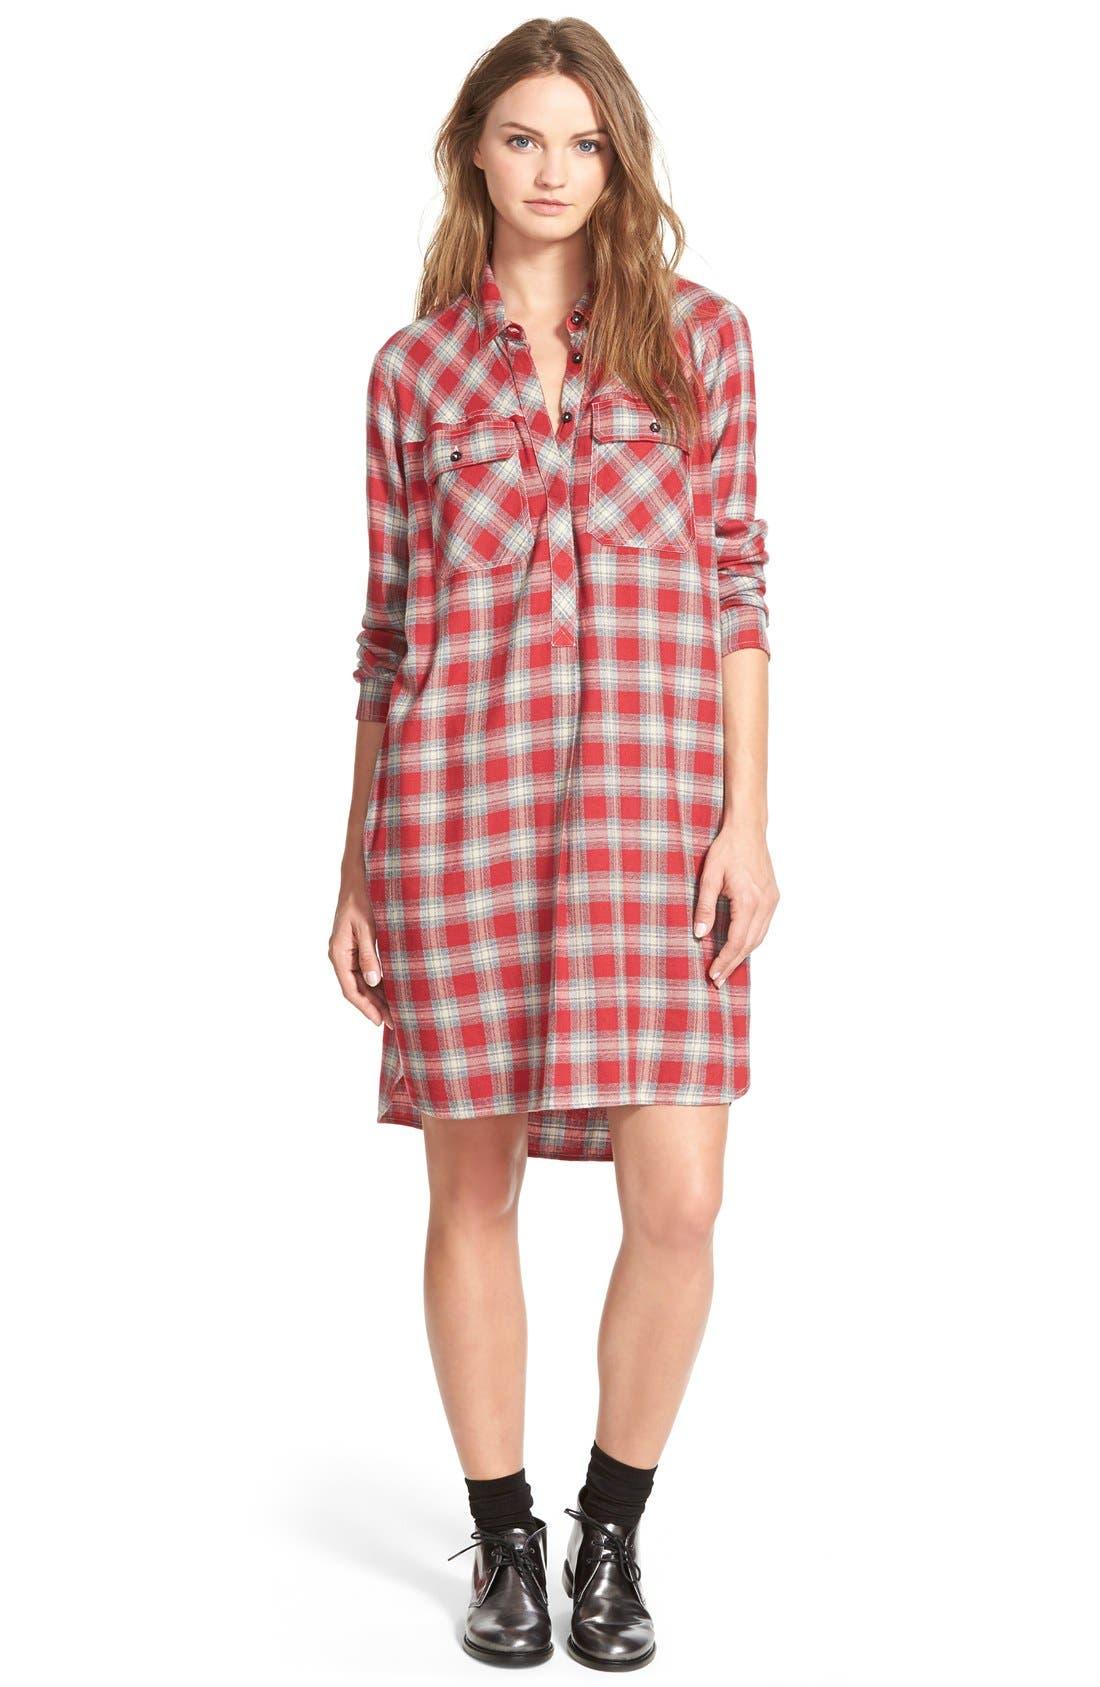 Alternate Image 1 Selected - MadewellPlaid Shirtdress